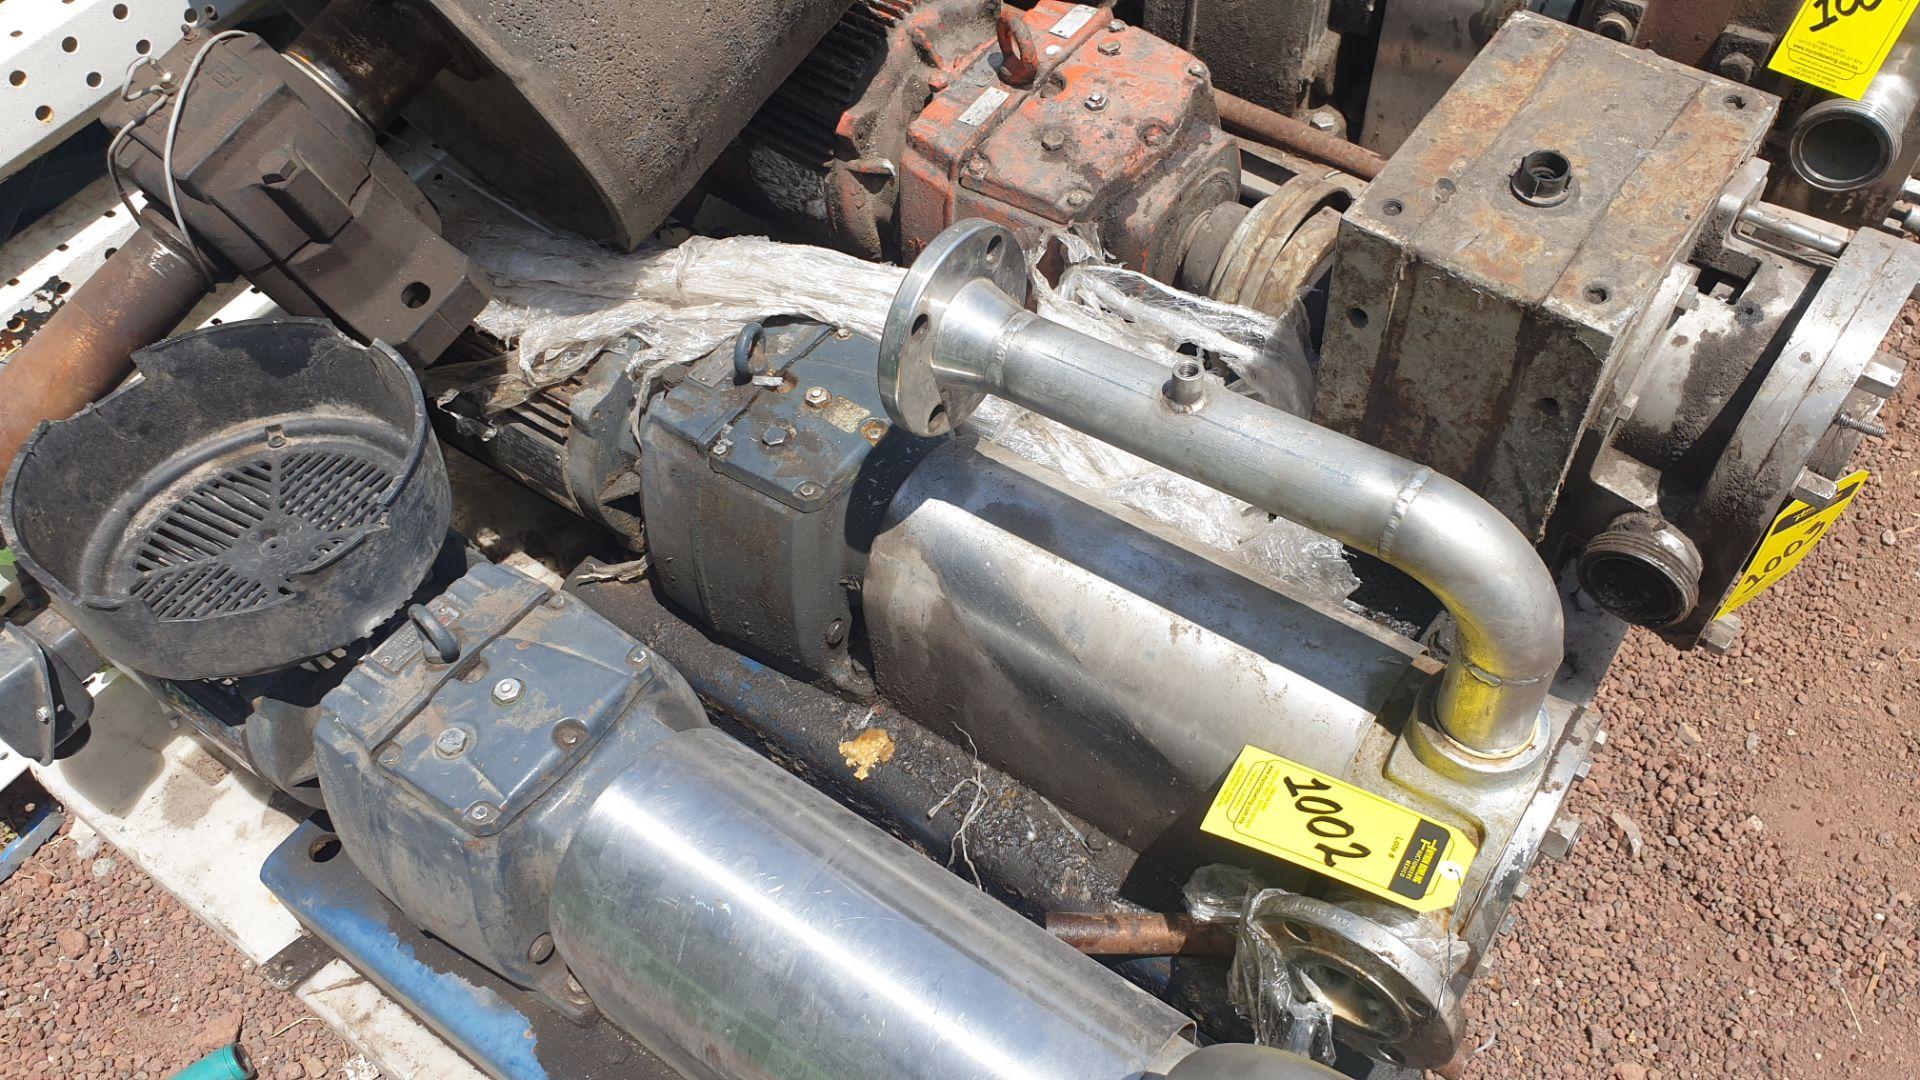 Pneumatic pump, includes emerson motor, model 684982 capacity 10Hp 230v - 460v - Image 7 of 8